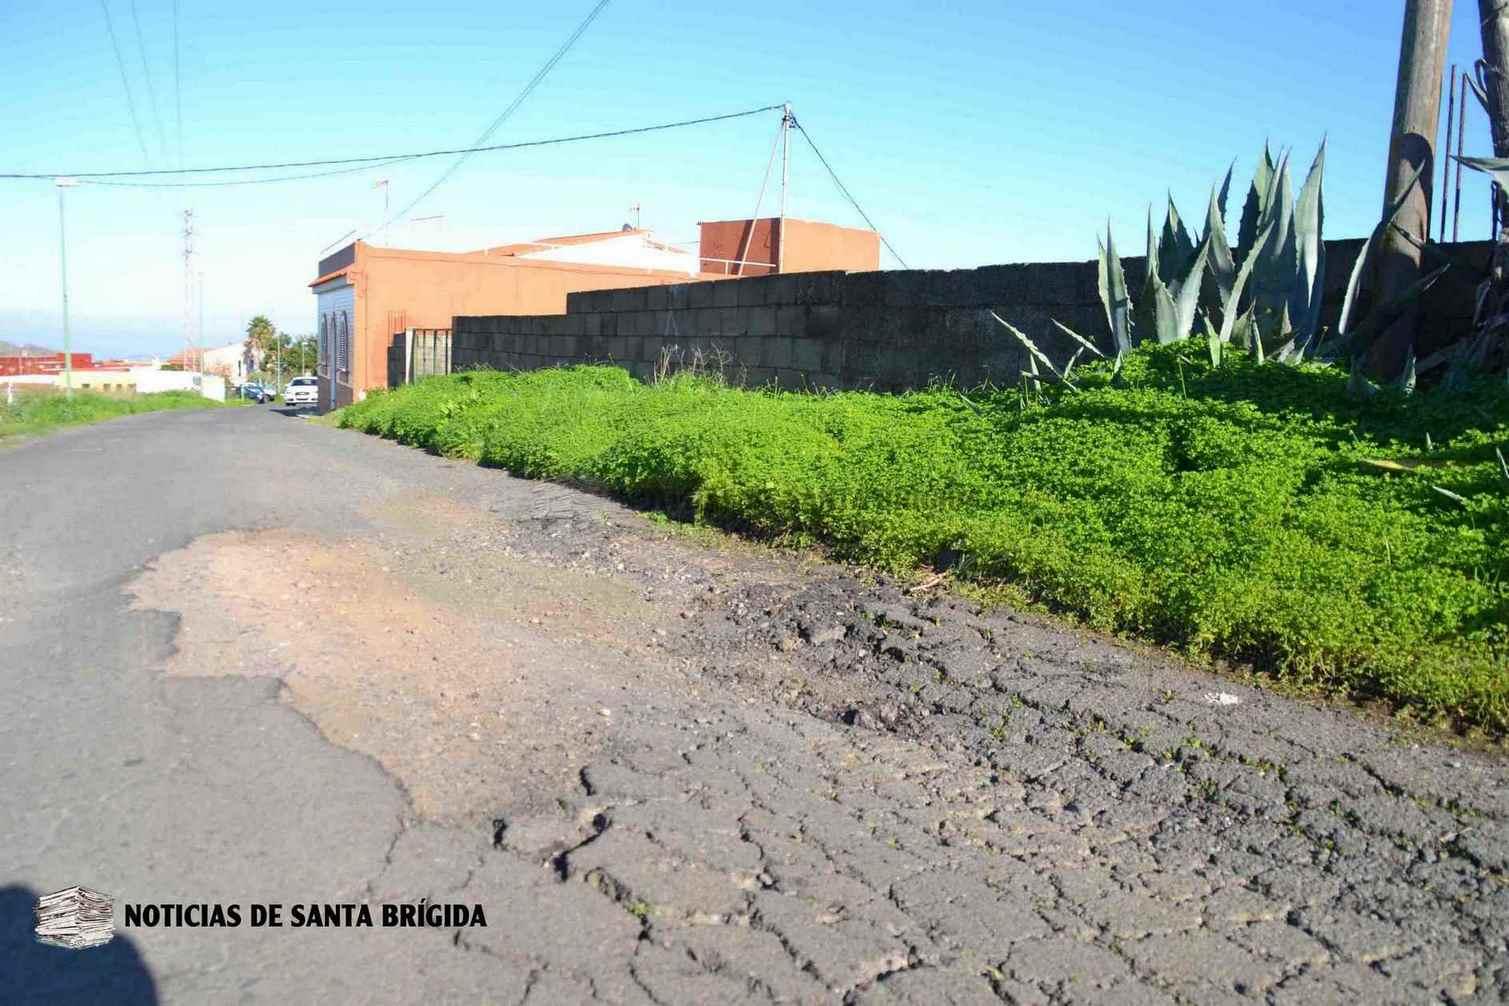 carretera El Piquillo Llanos de Maria Rivera – Santa Brigida – Noticias de Santa Brígida – Laura Miranda